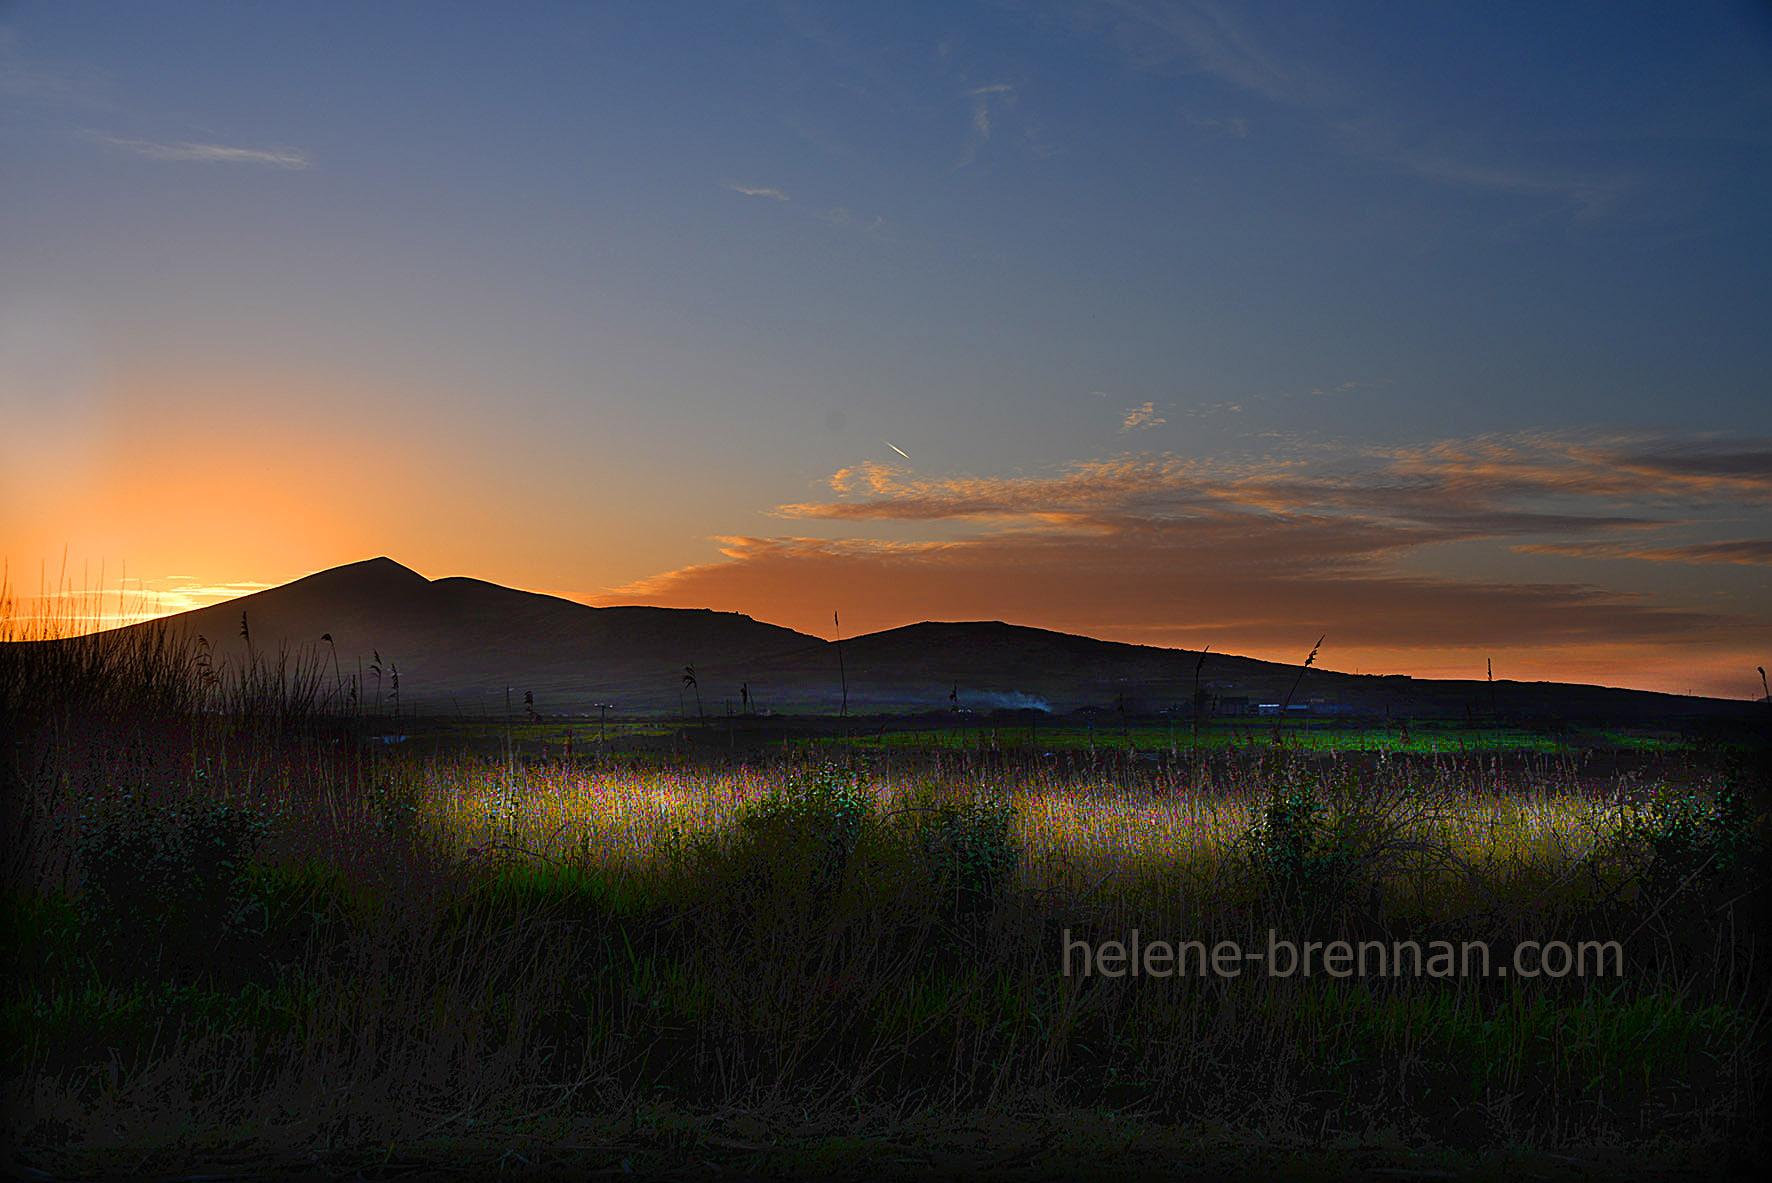 DSC_1341 Emlagh Dingle Sunset